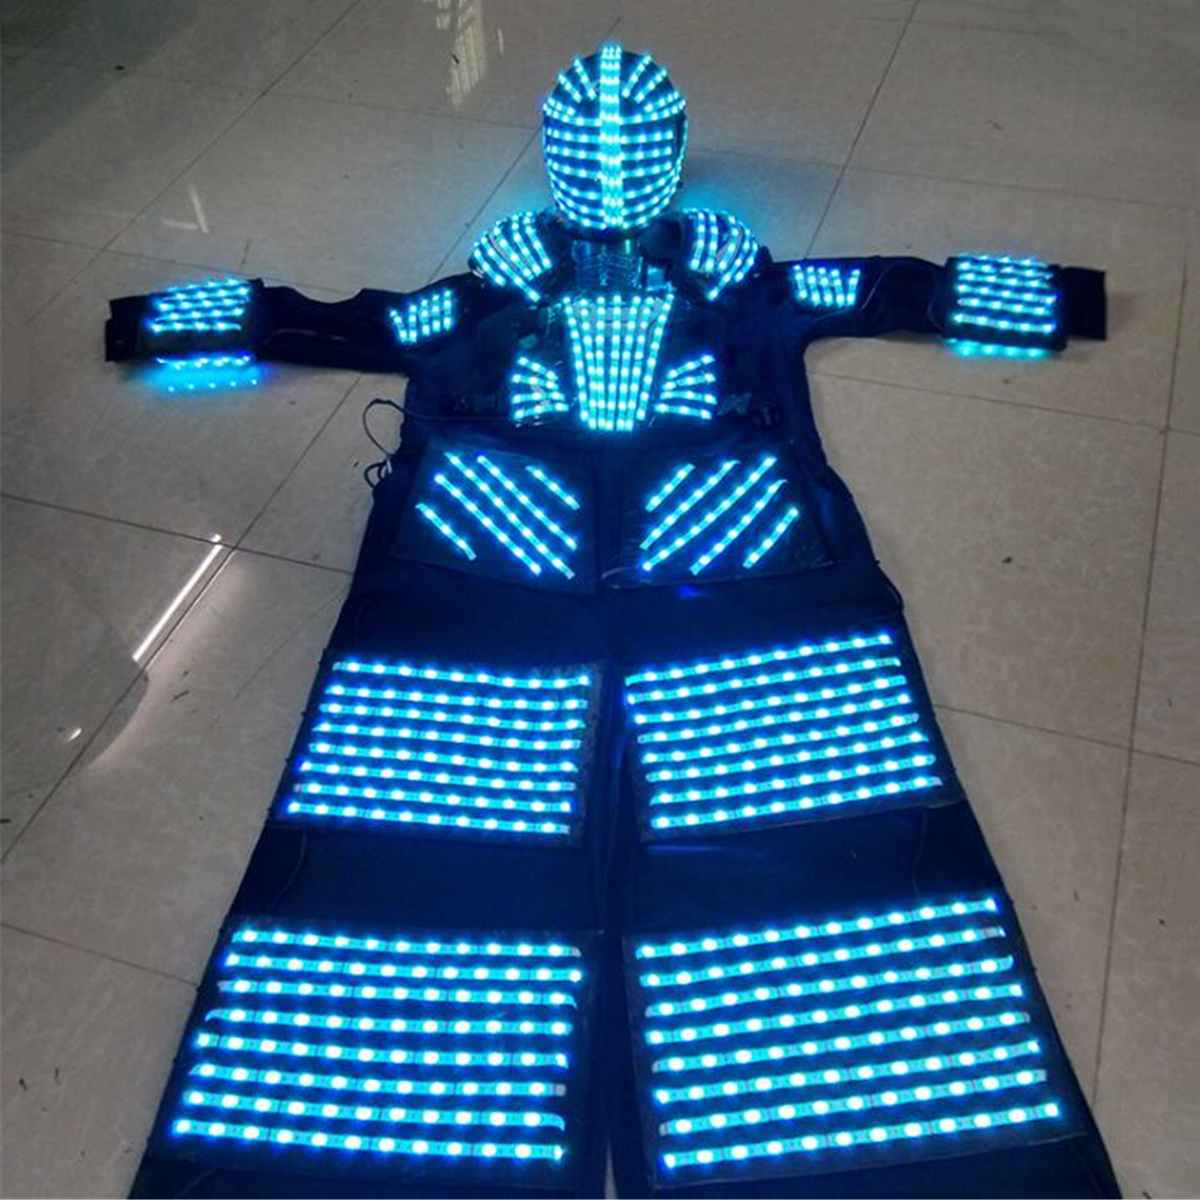 Stelten Walker RGB LED Licht LED Danser ~ Kostuum LED Robot Pak Voor Party Prestaties Elektronische Muziek Festival ~ DJ tonen - 3